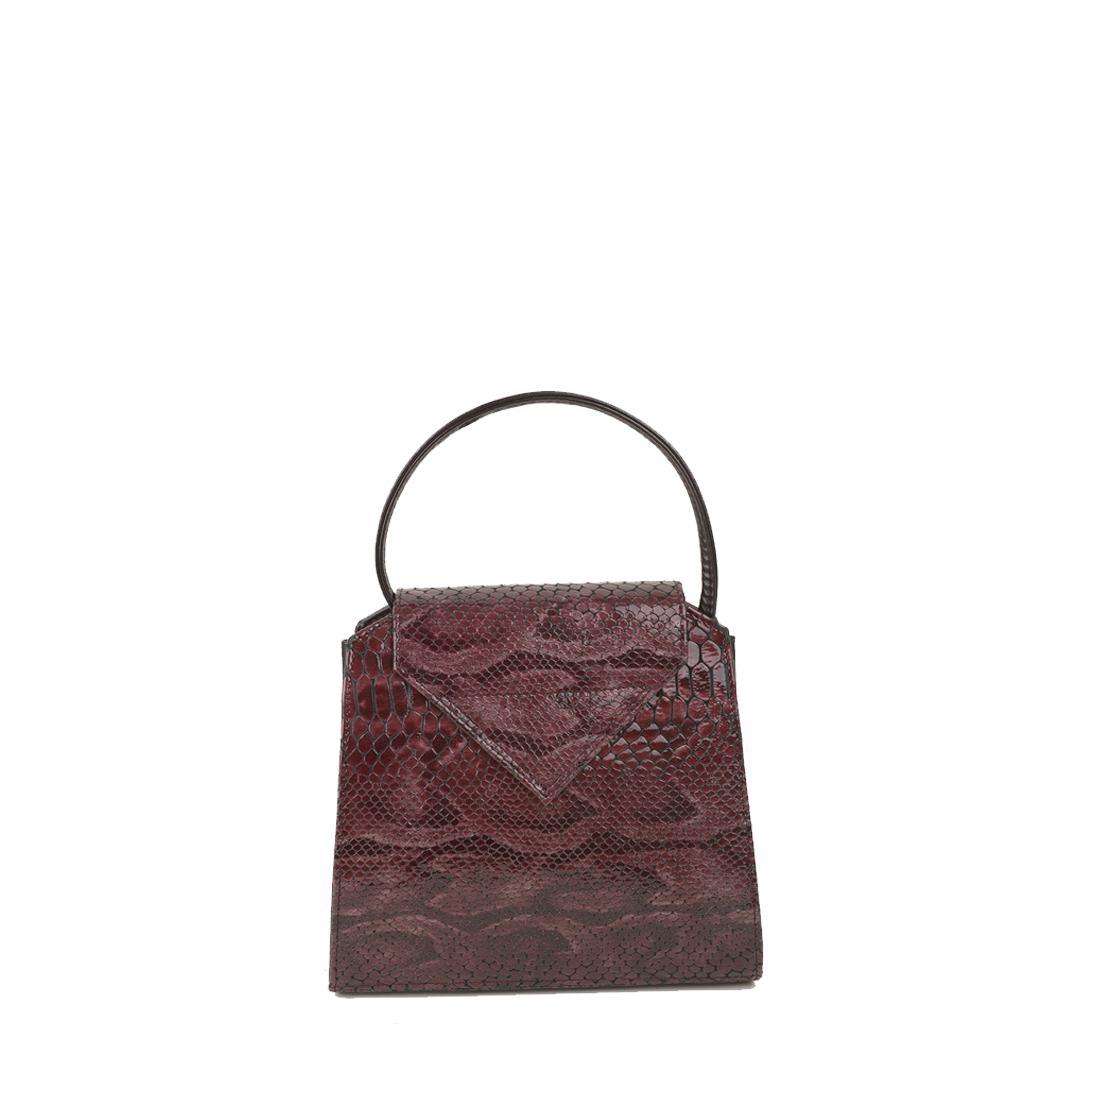 Yasmin Plum Python Print Leather Evening Shoulder Bag